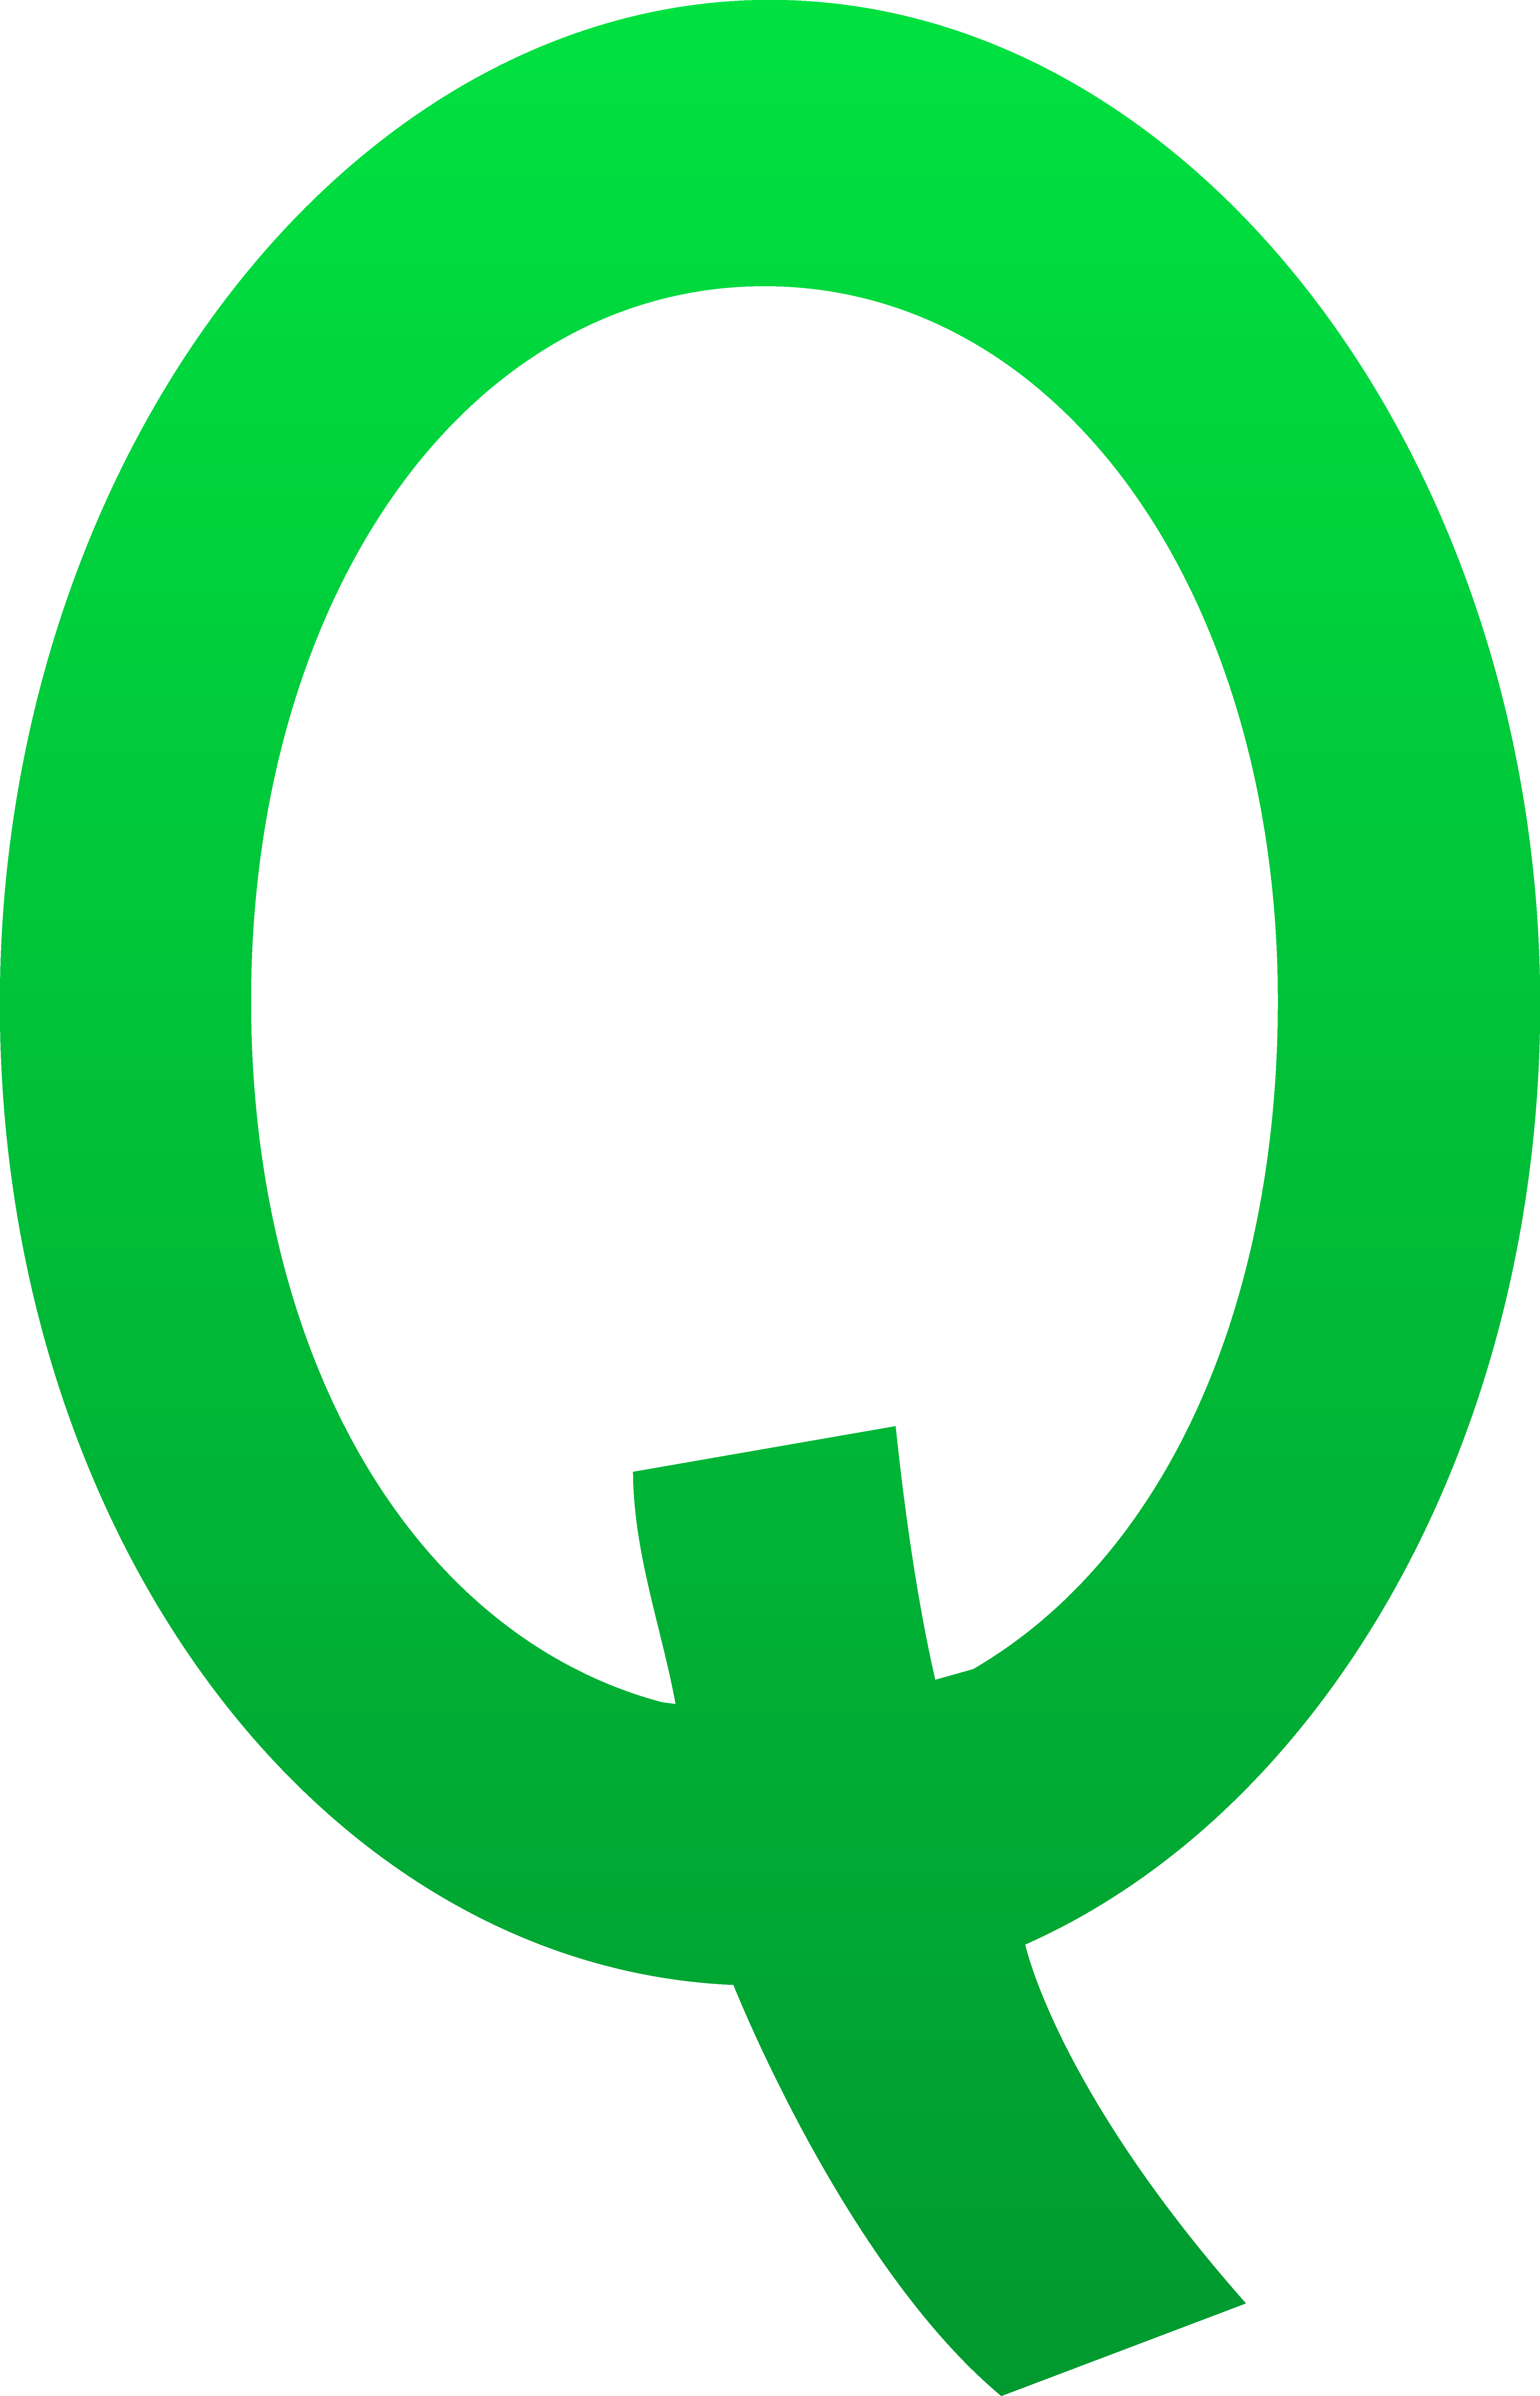 The Letter Q.